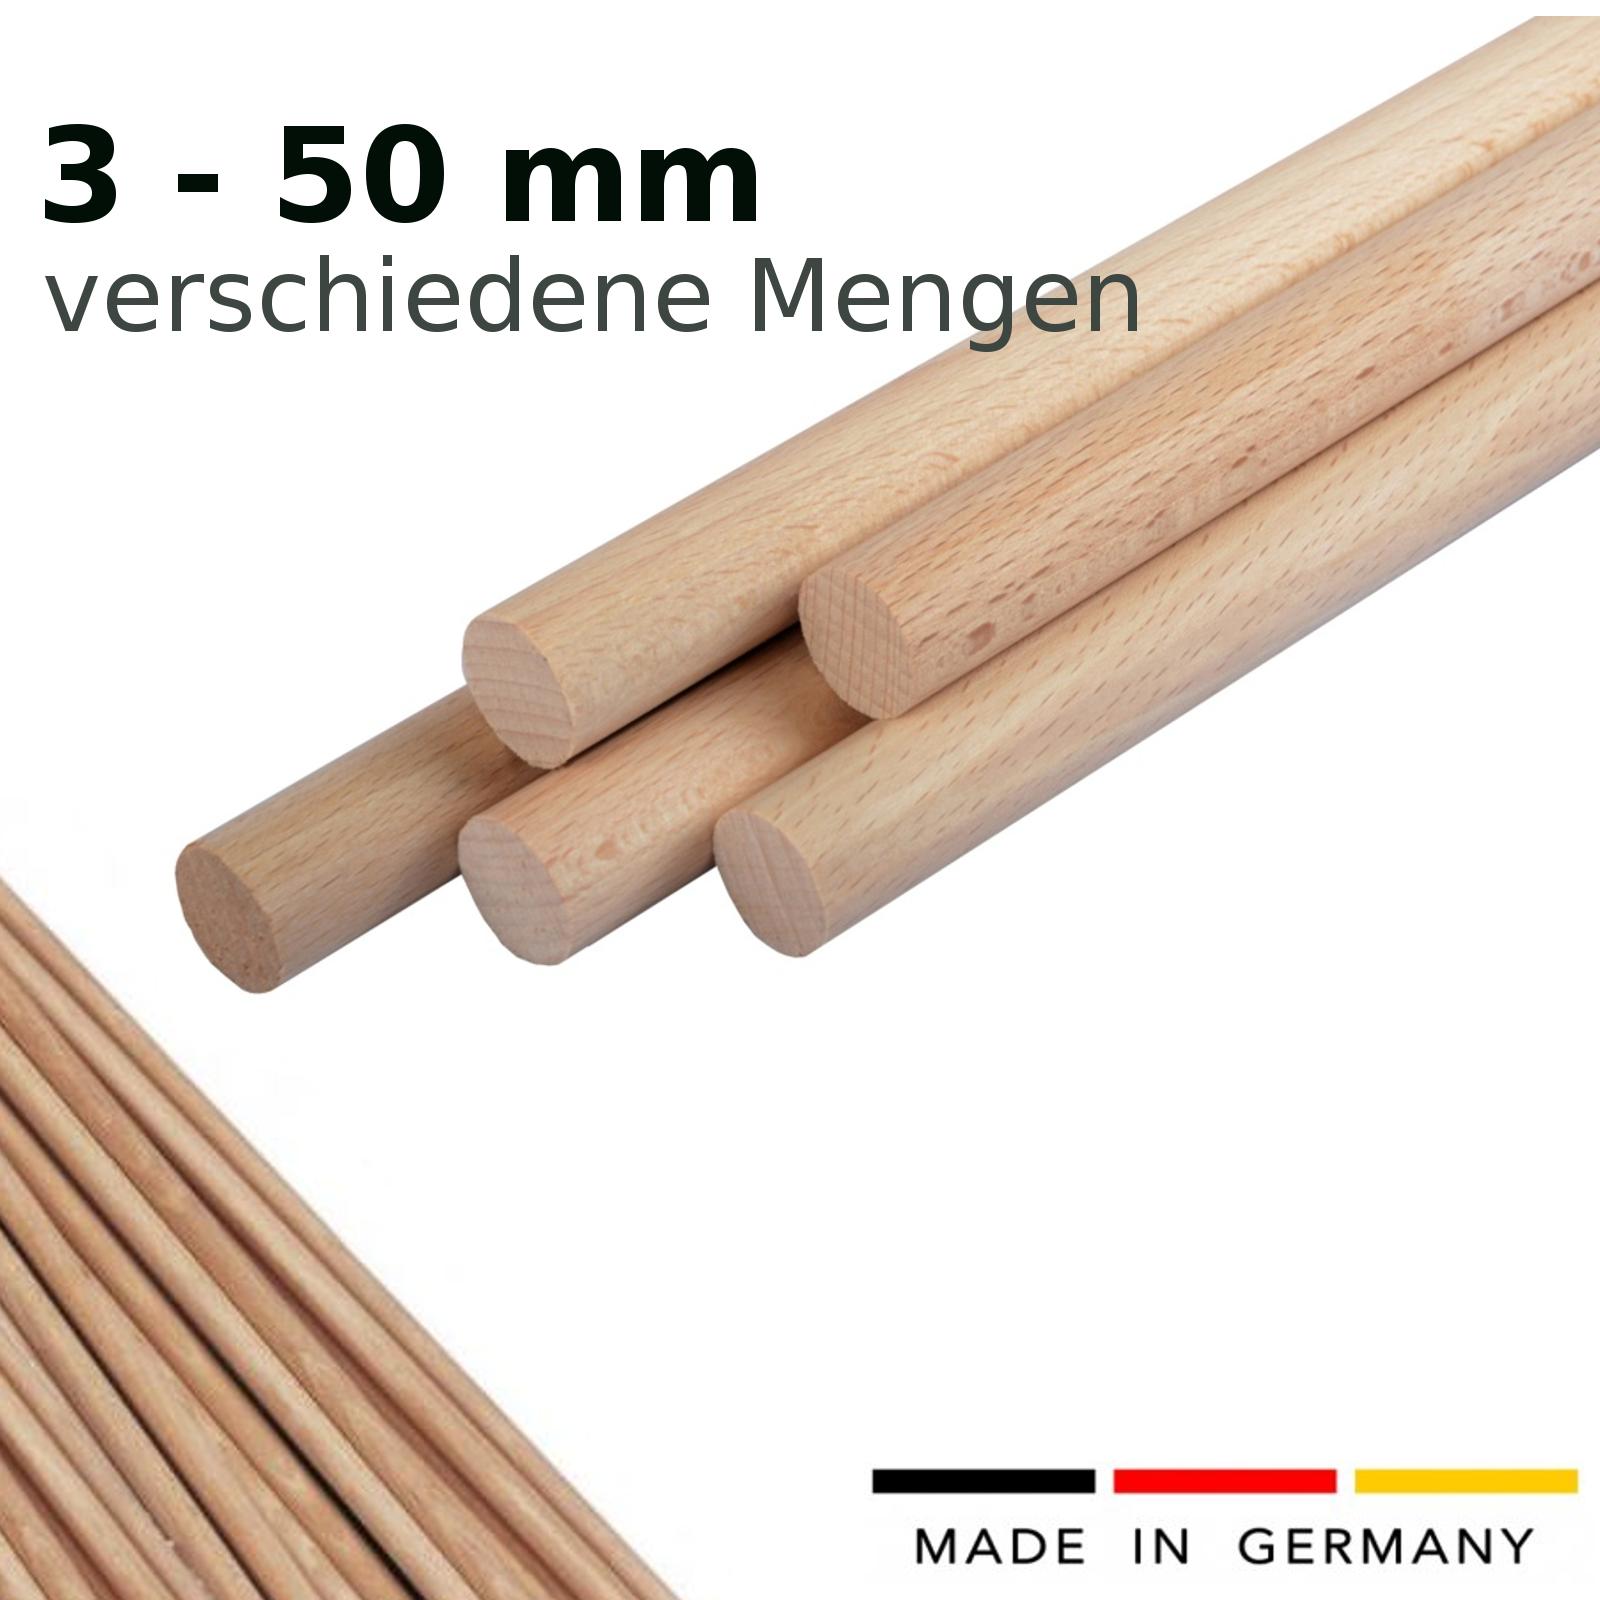 100 er Set - 100 Stück Rundstab Buche glatt - Rundstäbe - Buchestab (100 Stck)